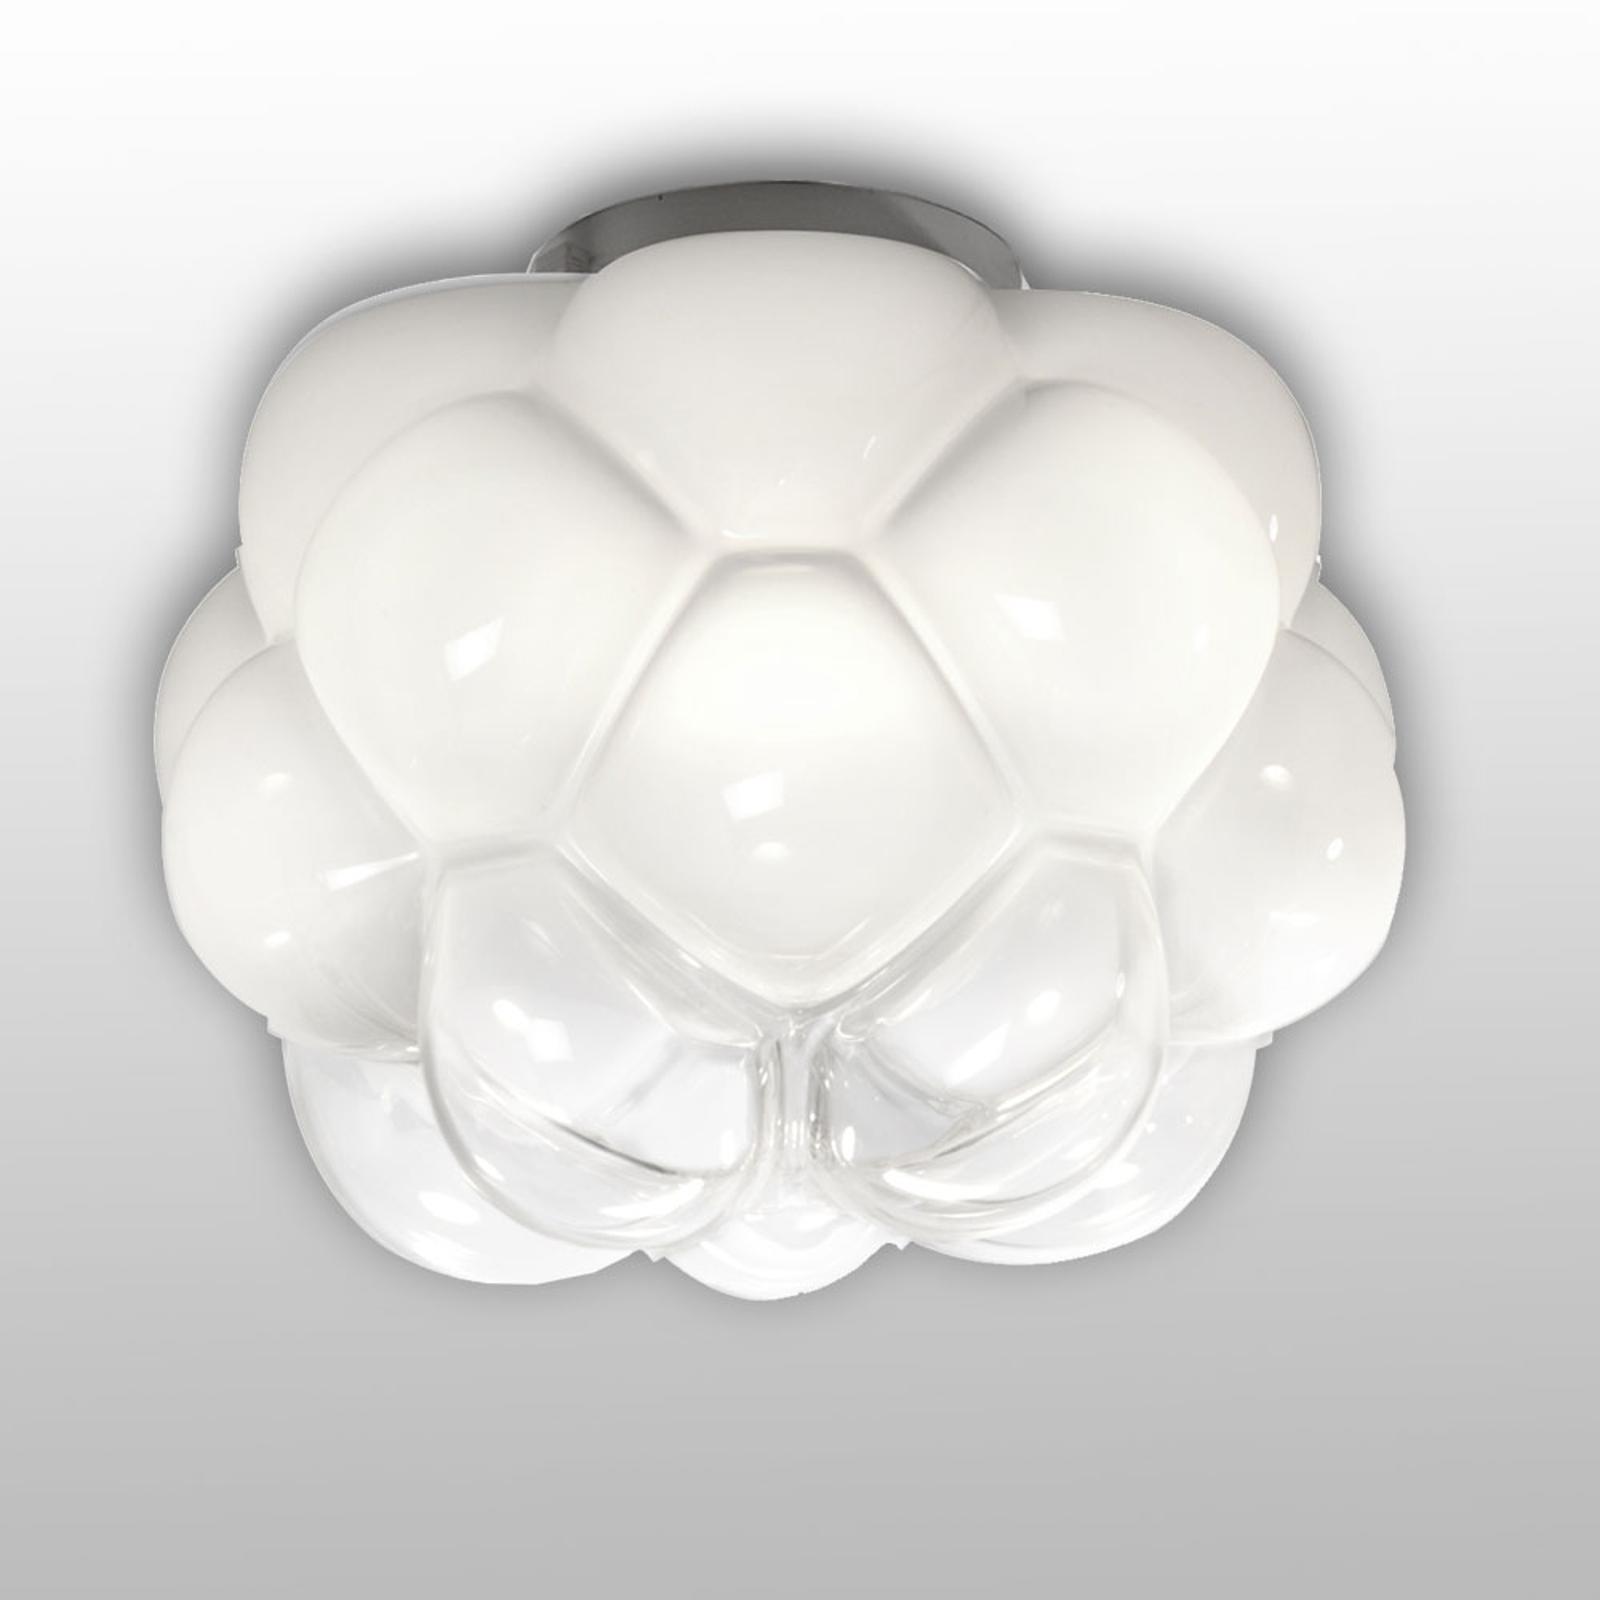 Fabbian Cloudy - LED-loftlampe i skyform, 26 cm